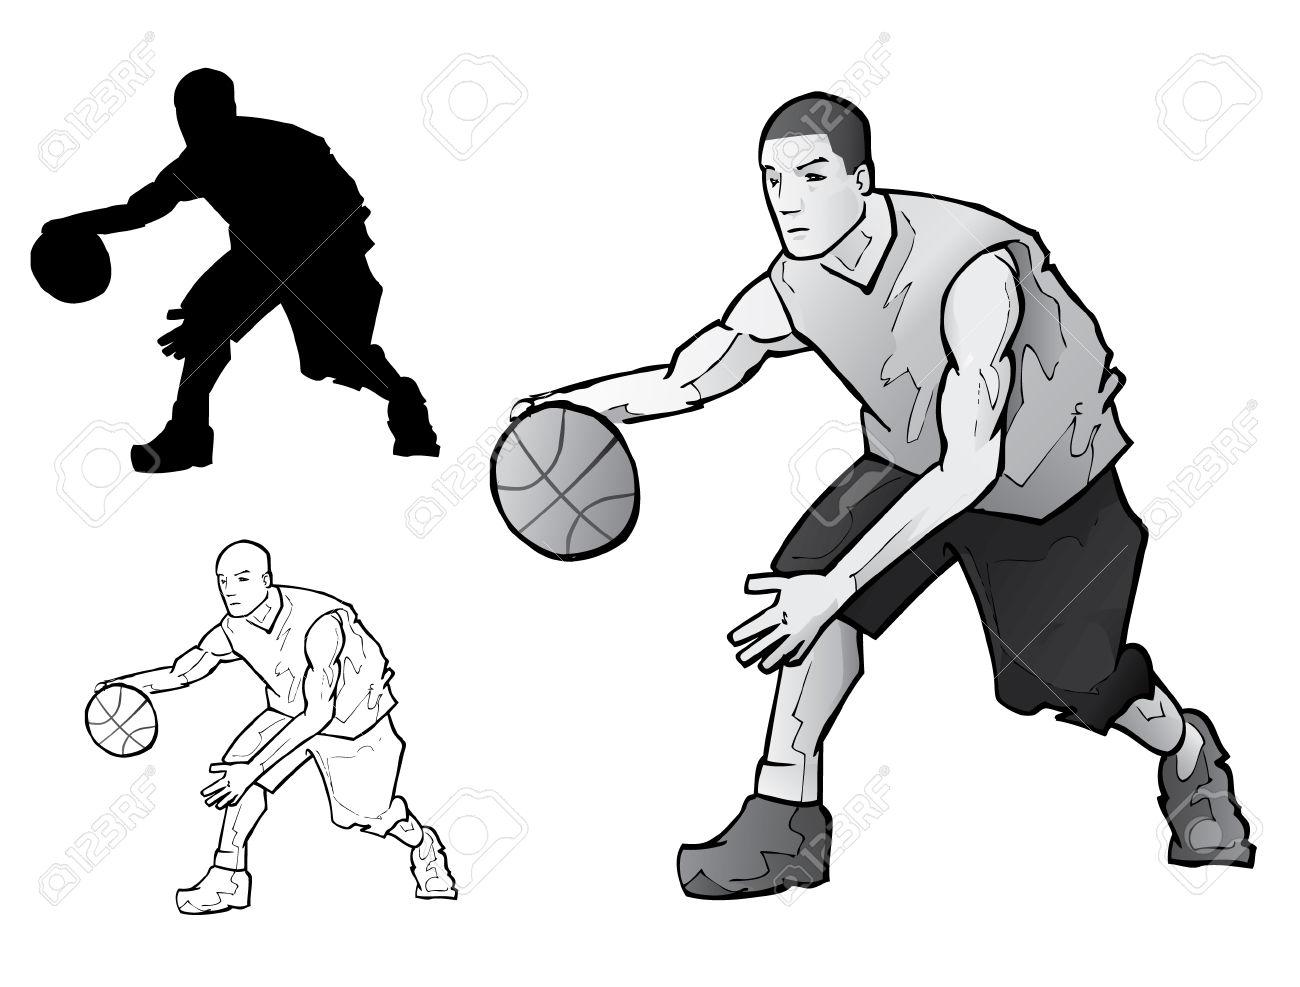 1300x987 7558888 Basketball Player Dribbling Stock Vector Silhouette